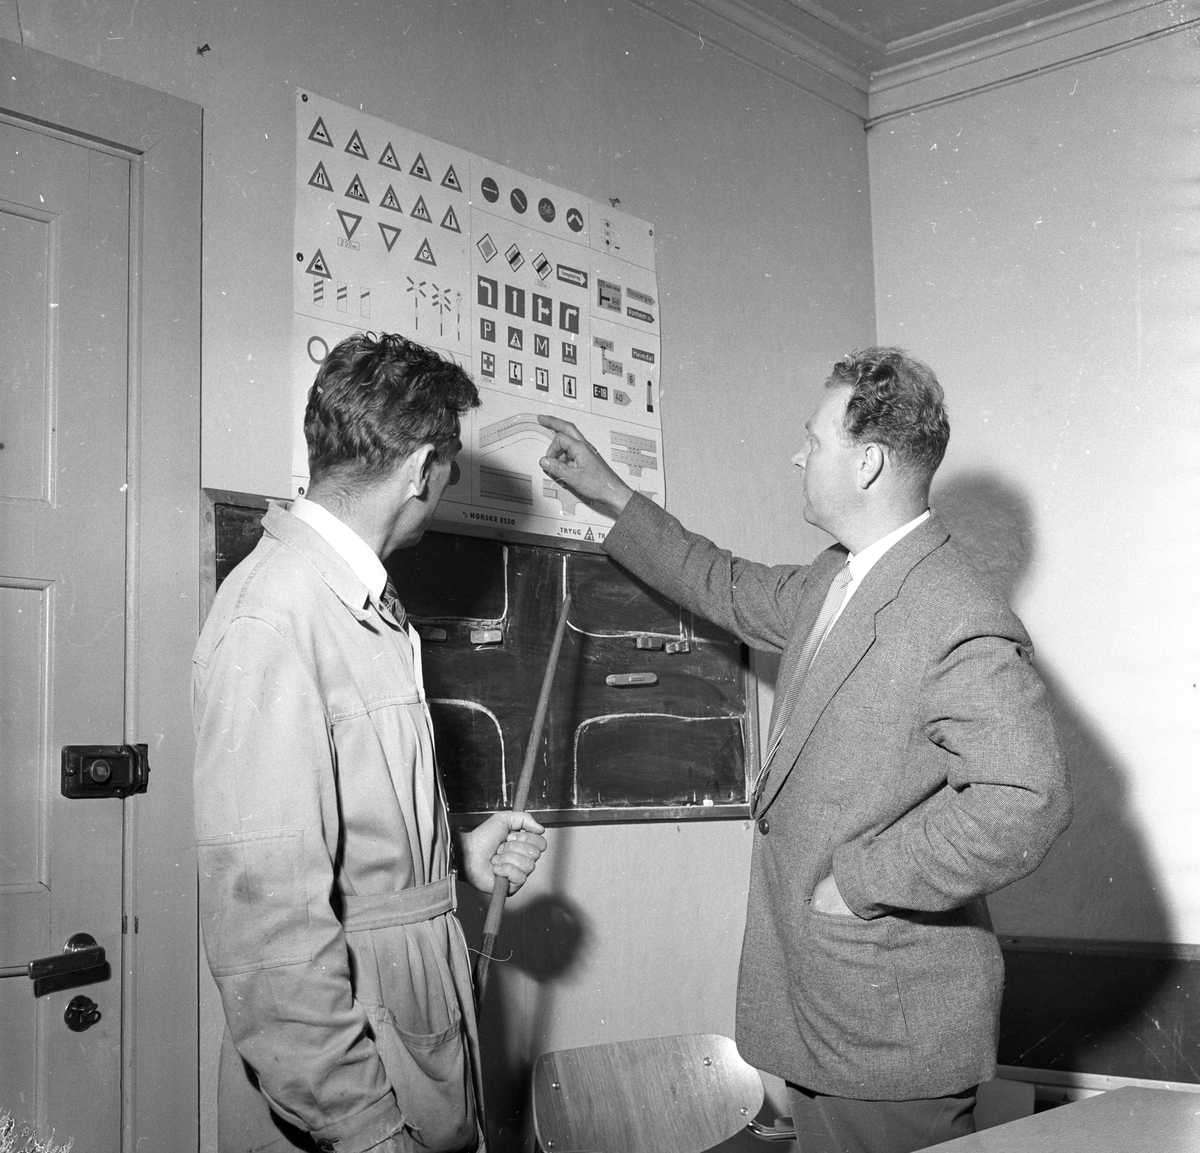 Sjåfør får trafikkundevisning på Bilsakkyndige. Fotografert  24. juni 1959.